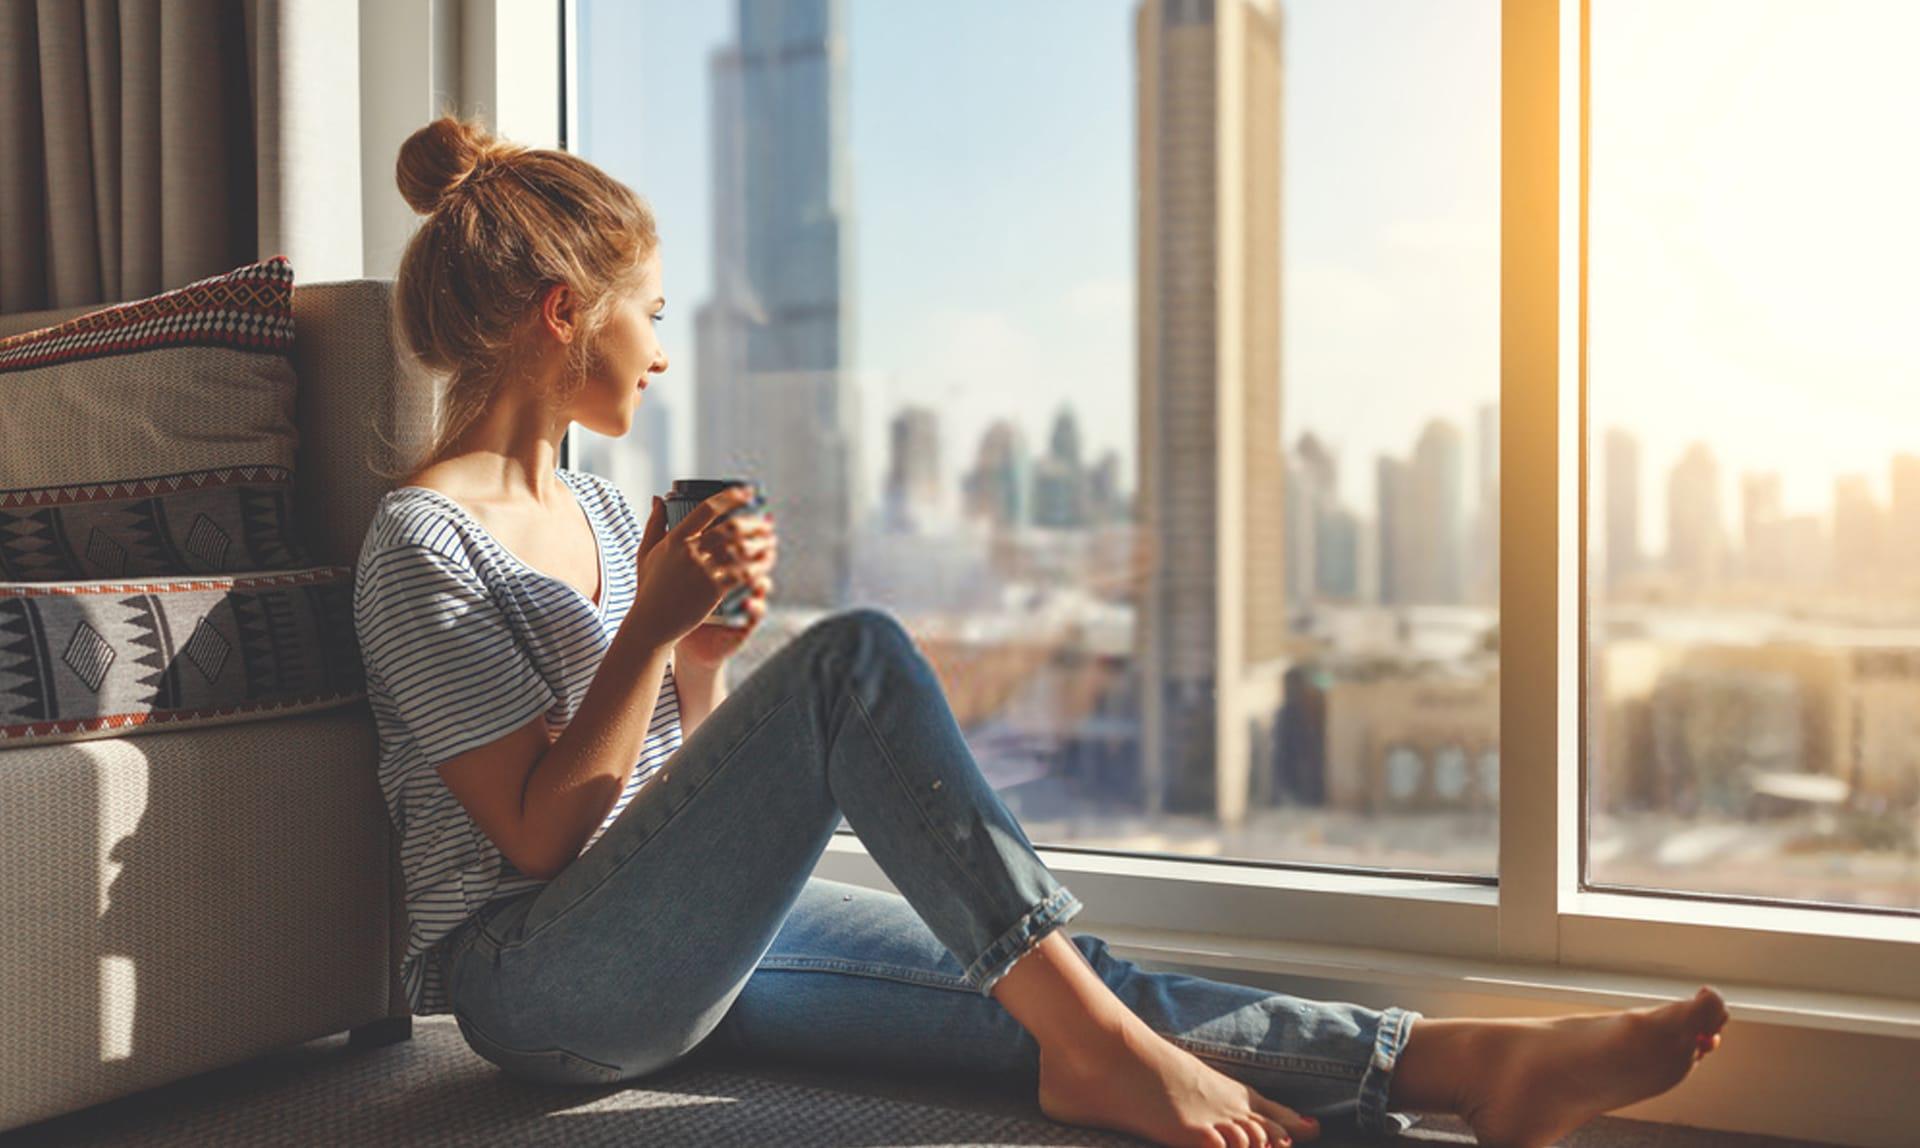 woman next to the big glazing